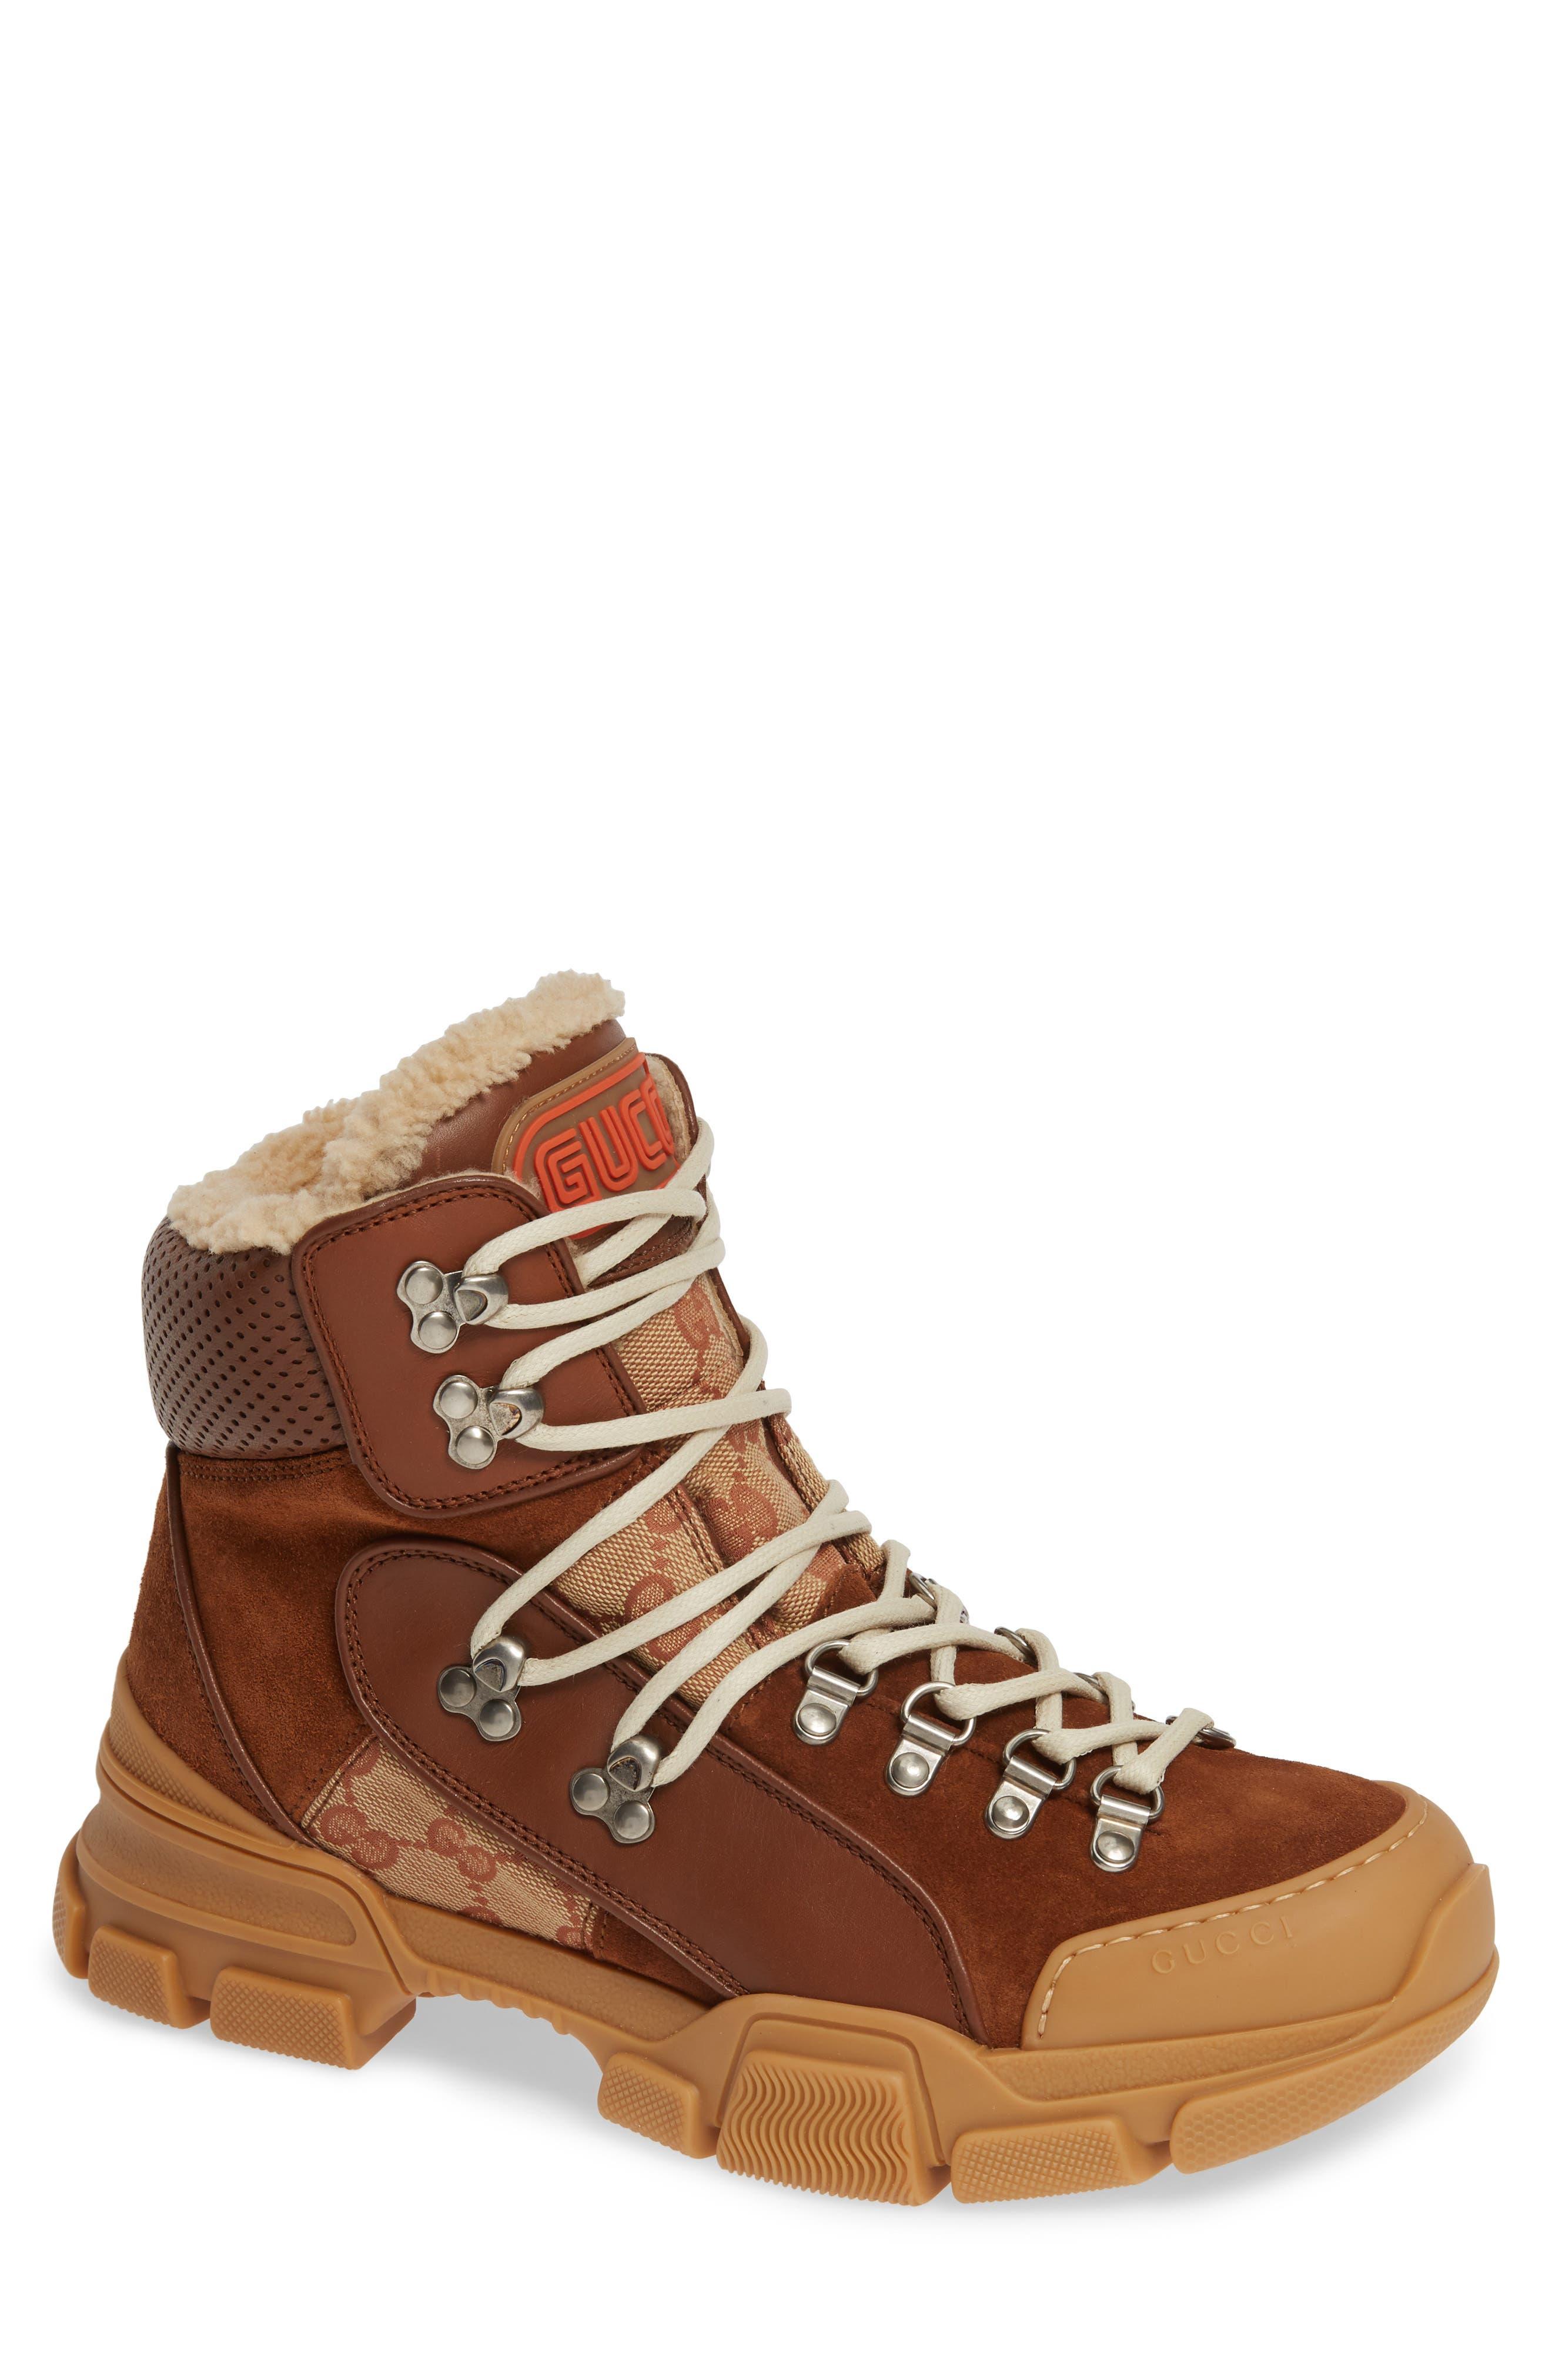 8bd3c69f51baa Gucci Flashtrek Genuine Shearling Boot